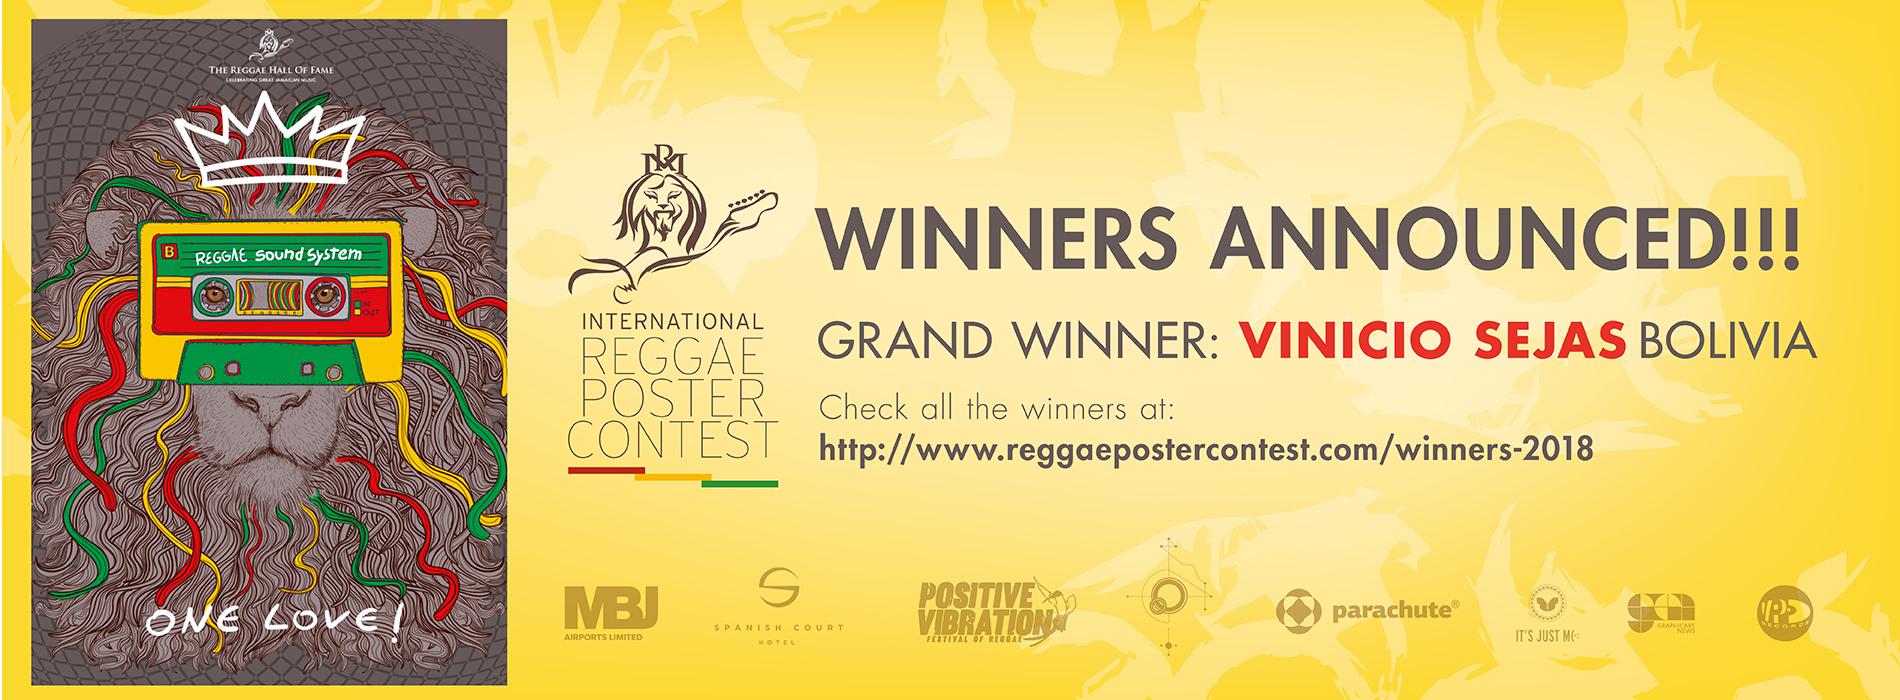 Winners Anounced